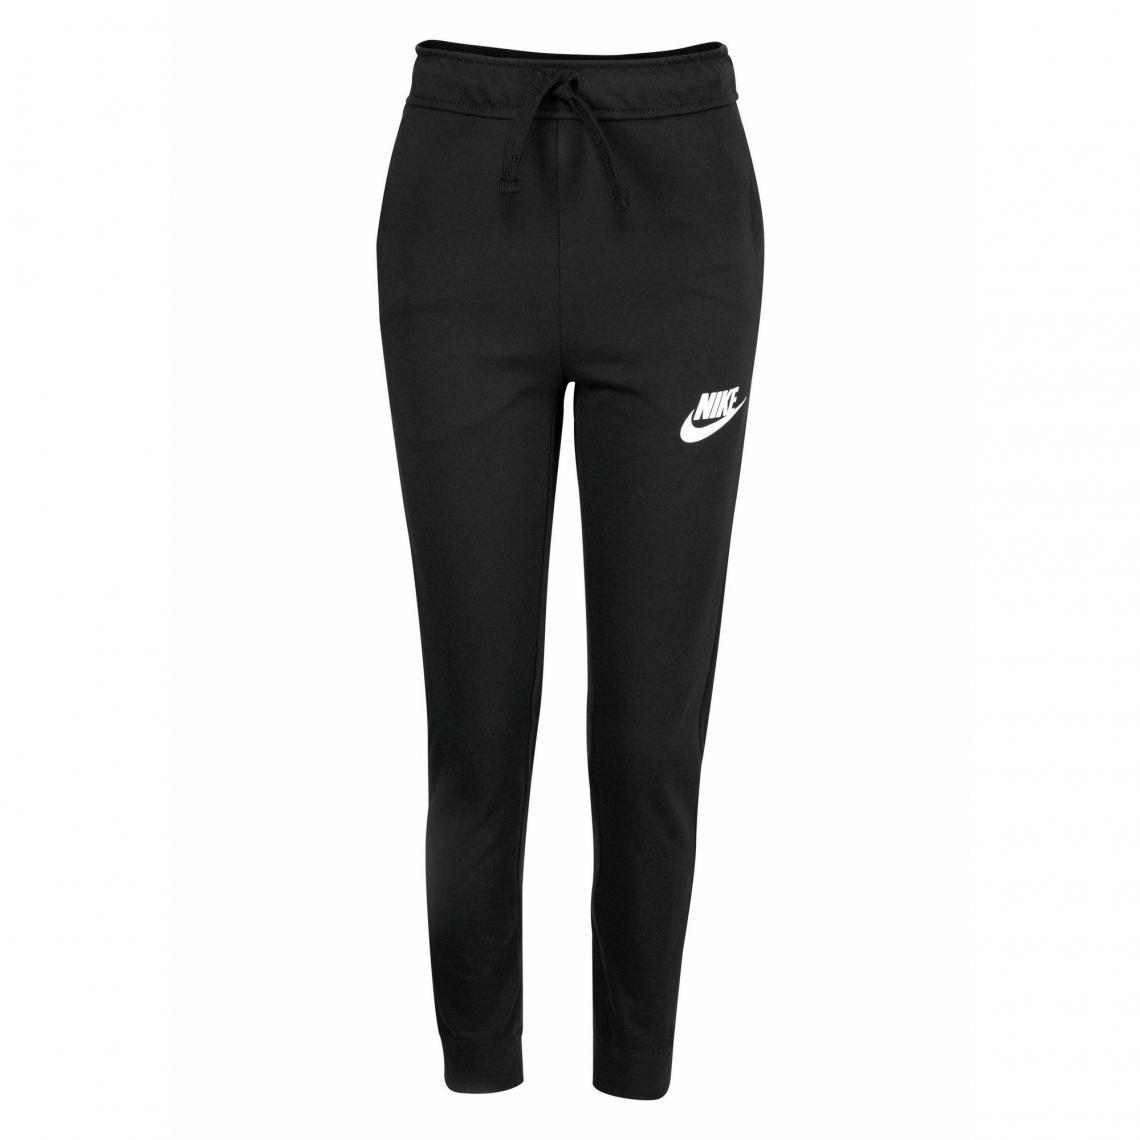 Pantalon de jogging junior Nike Sportswear AV15 - Noir Nike fcac4c43054